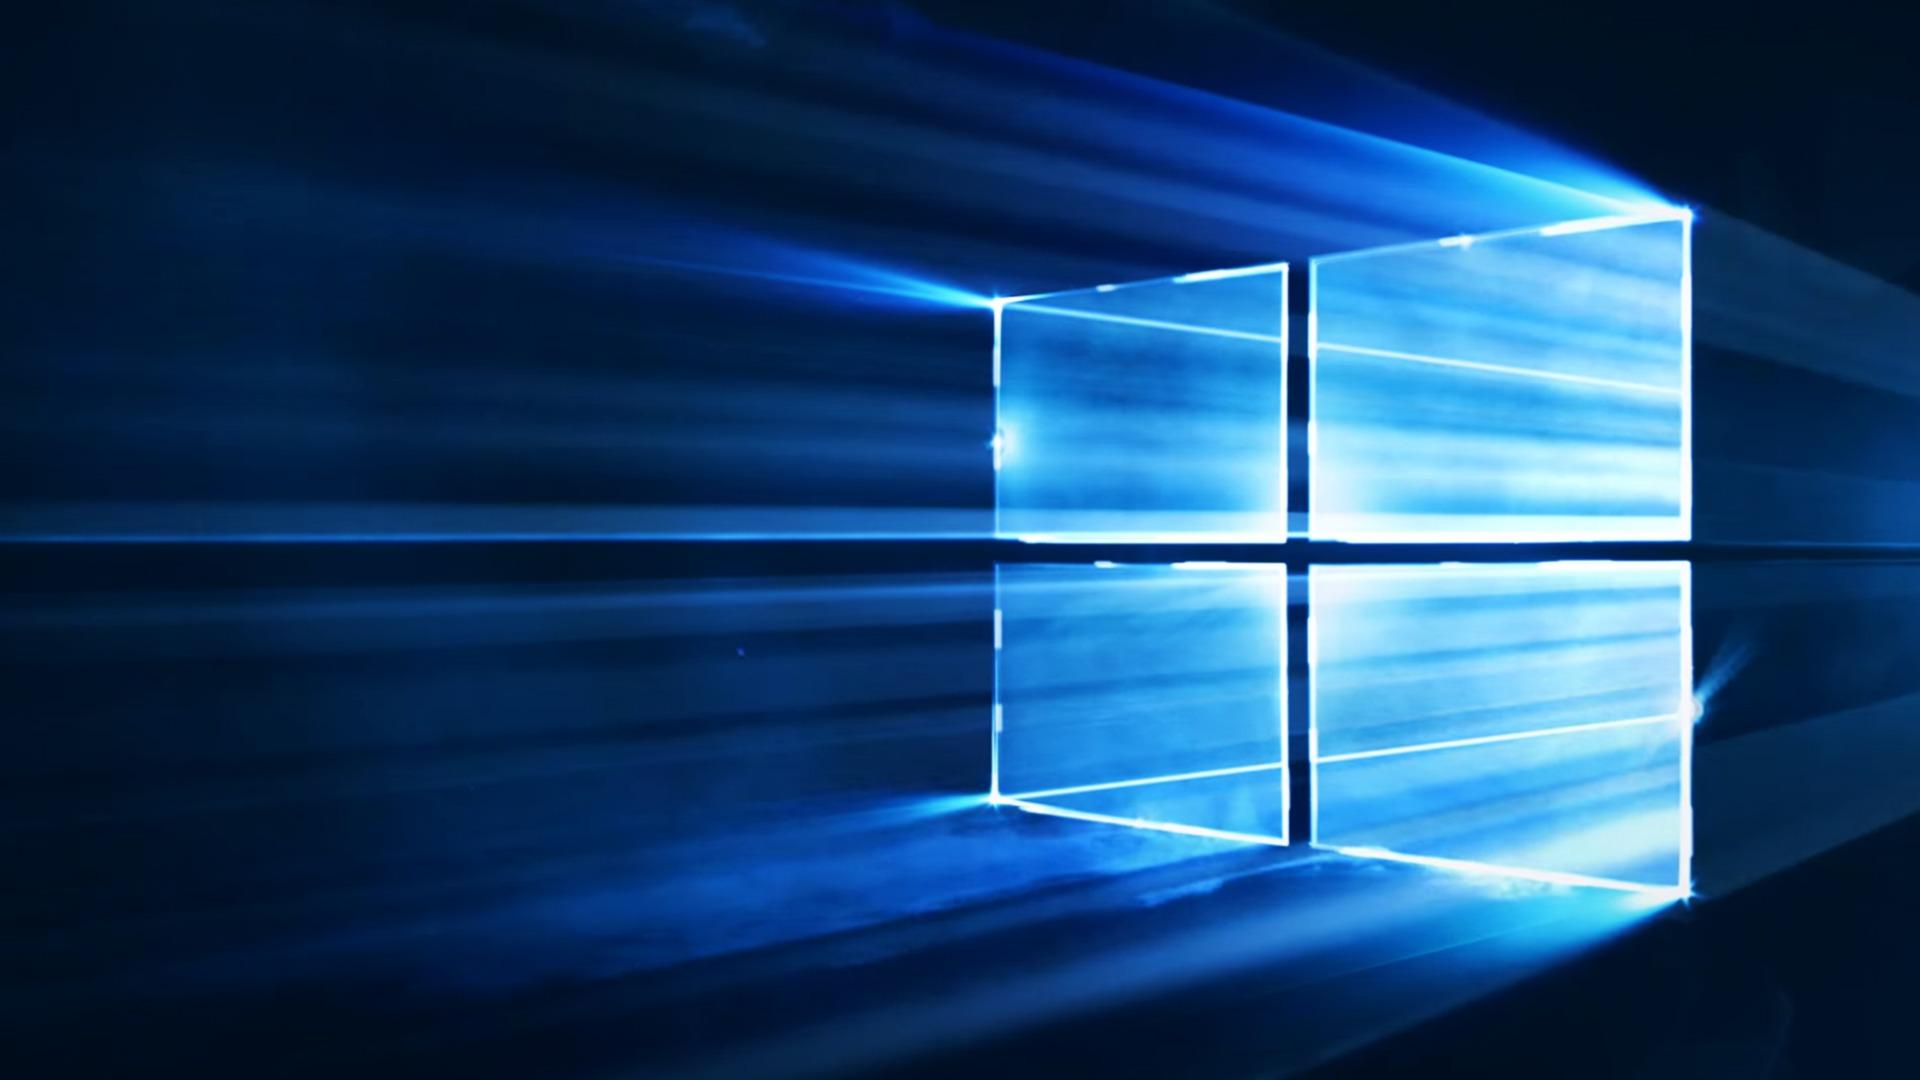 Gmunk Windows 10 , HD Wallpaper & Backgrounds